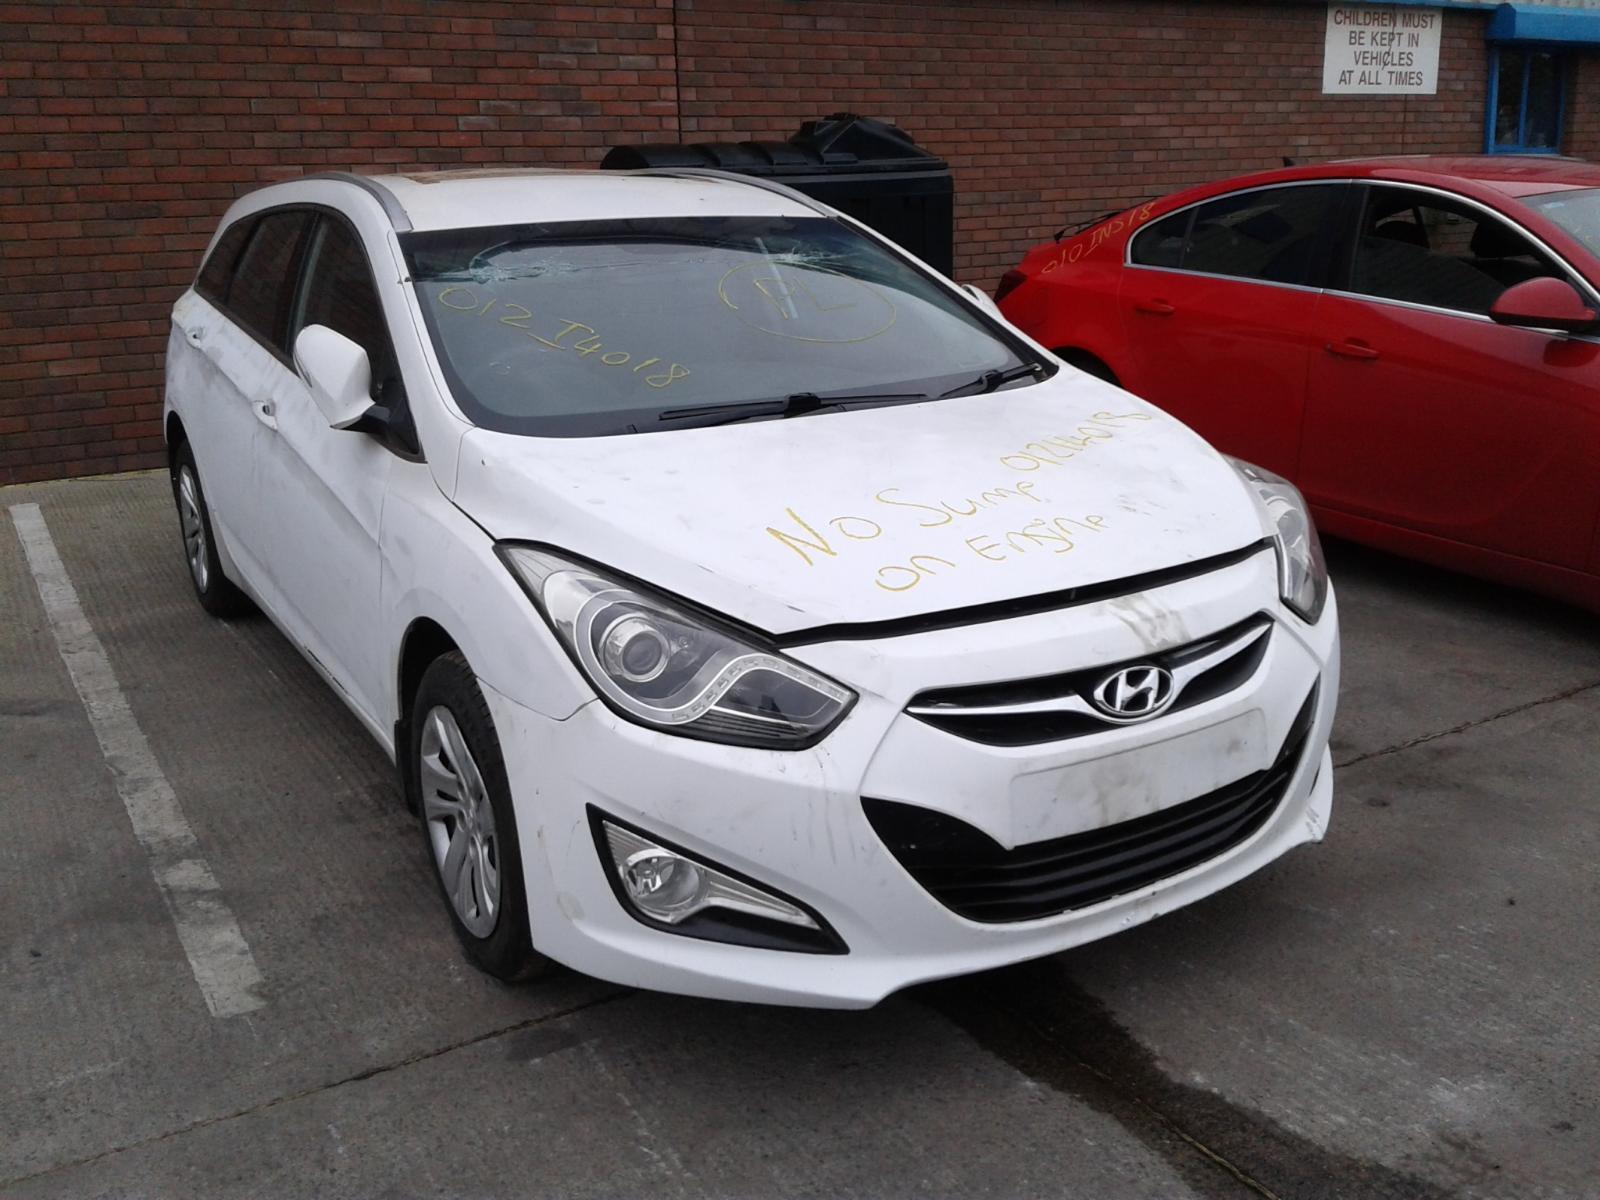 2013 Hyundai I40 Image